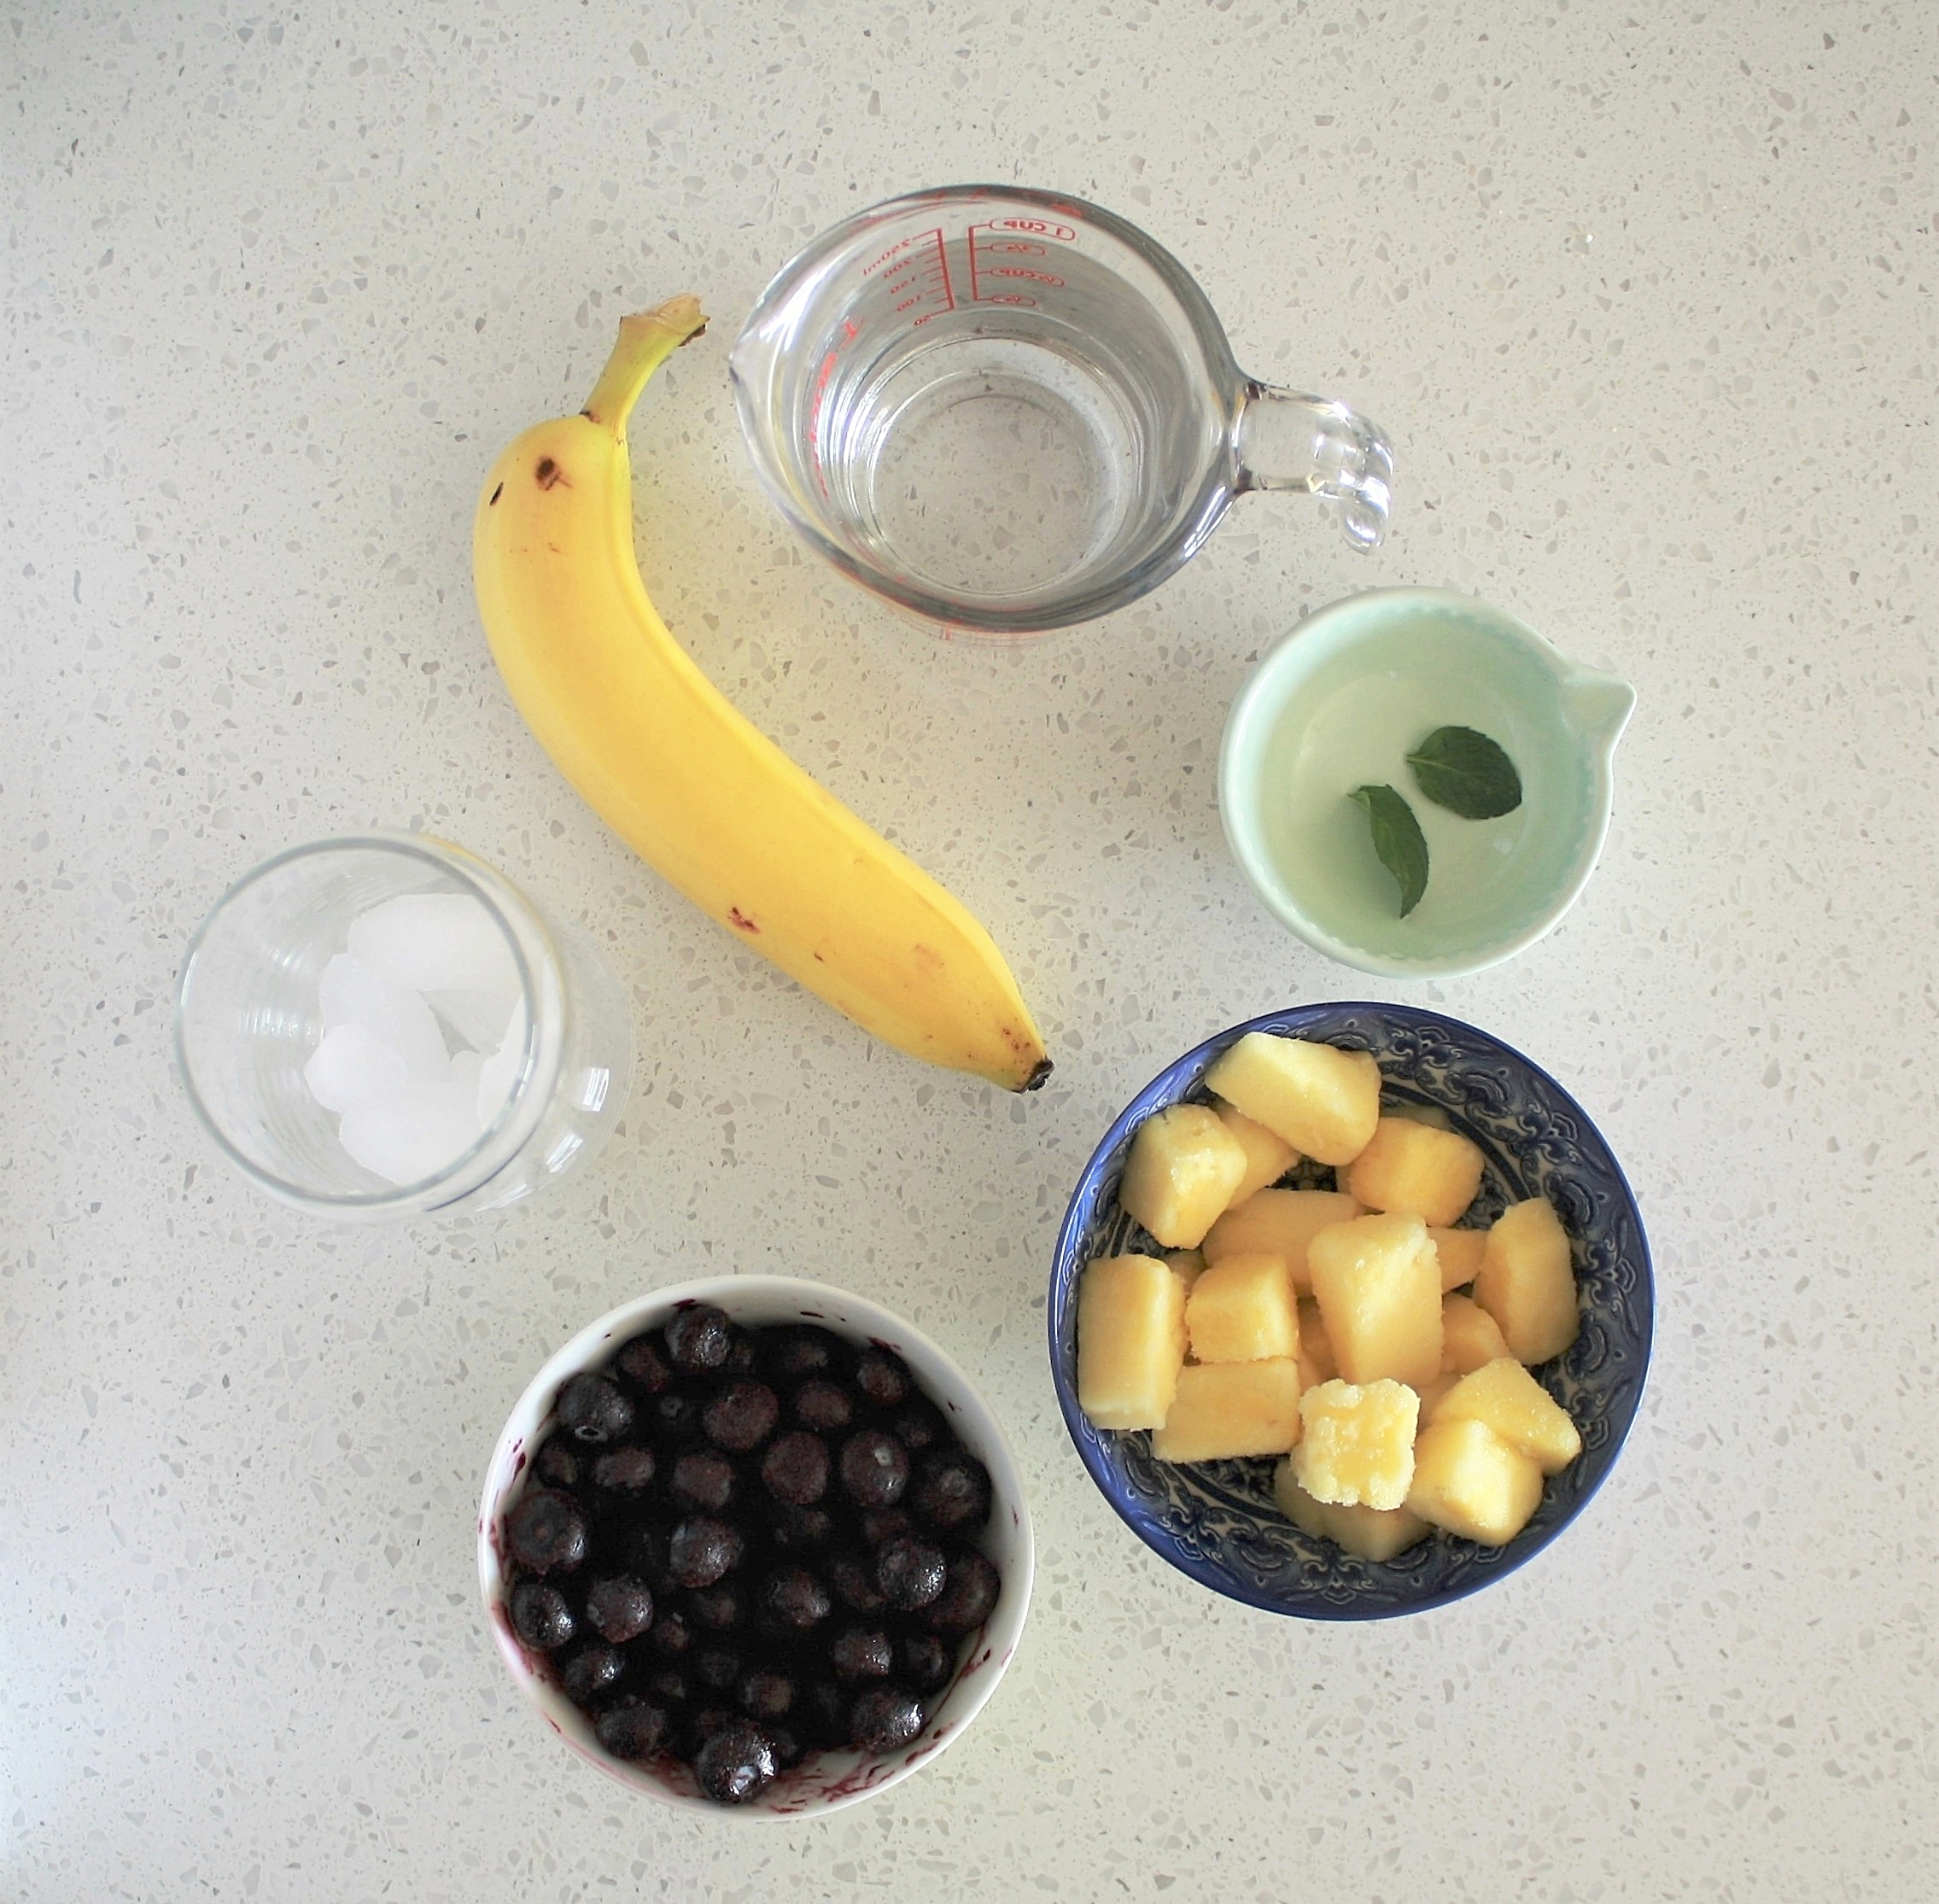 blueberry-banana-pineapple-mint-1a.JPG